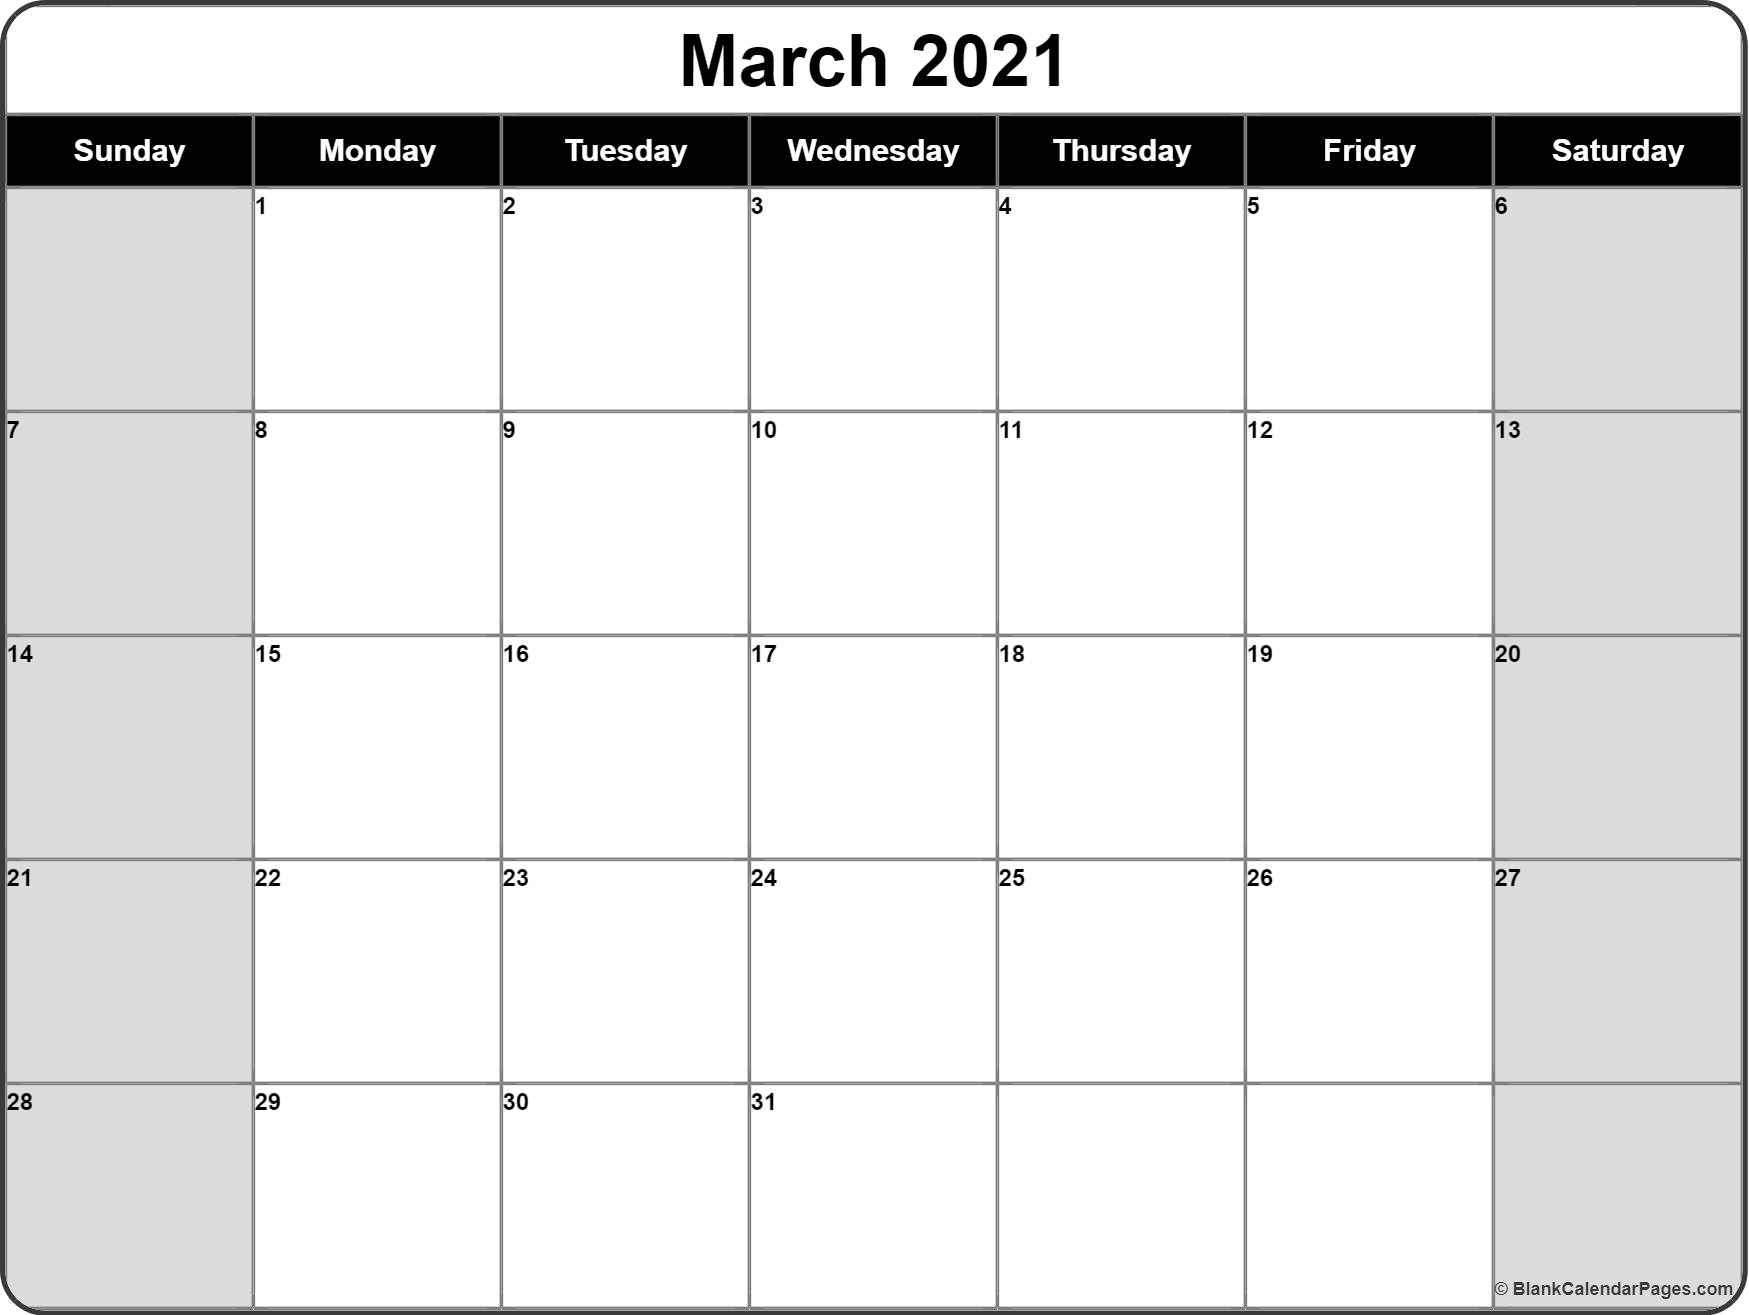 March 2021 Calendar   Free Printable Calendar Templates Regarding March Holidays 2021 Calendars